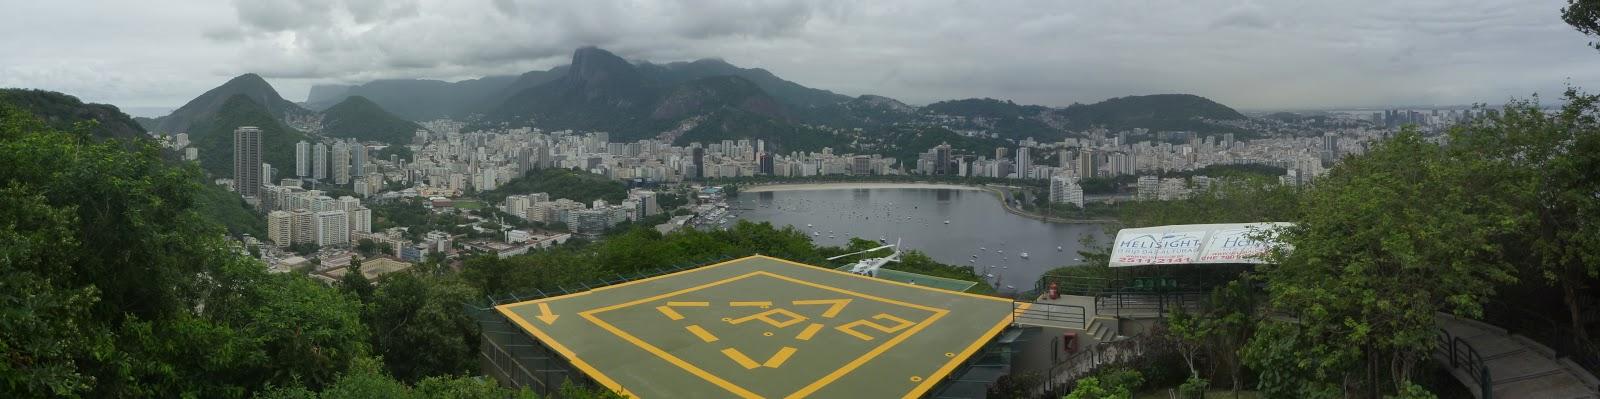 Panoramica desde la cima de Urca